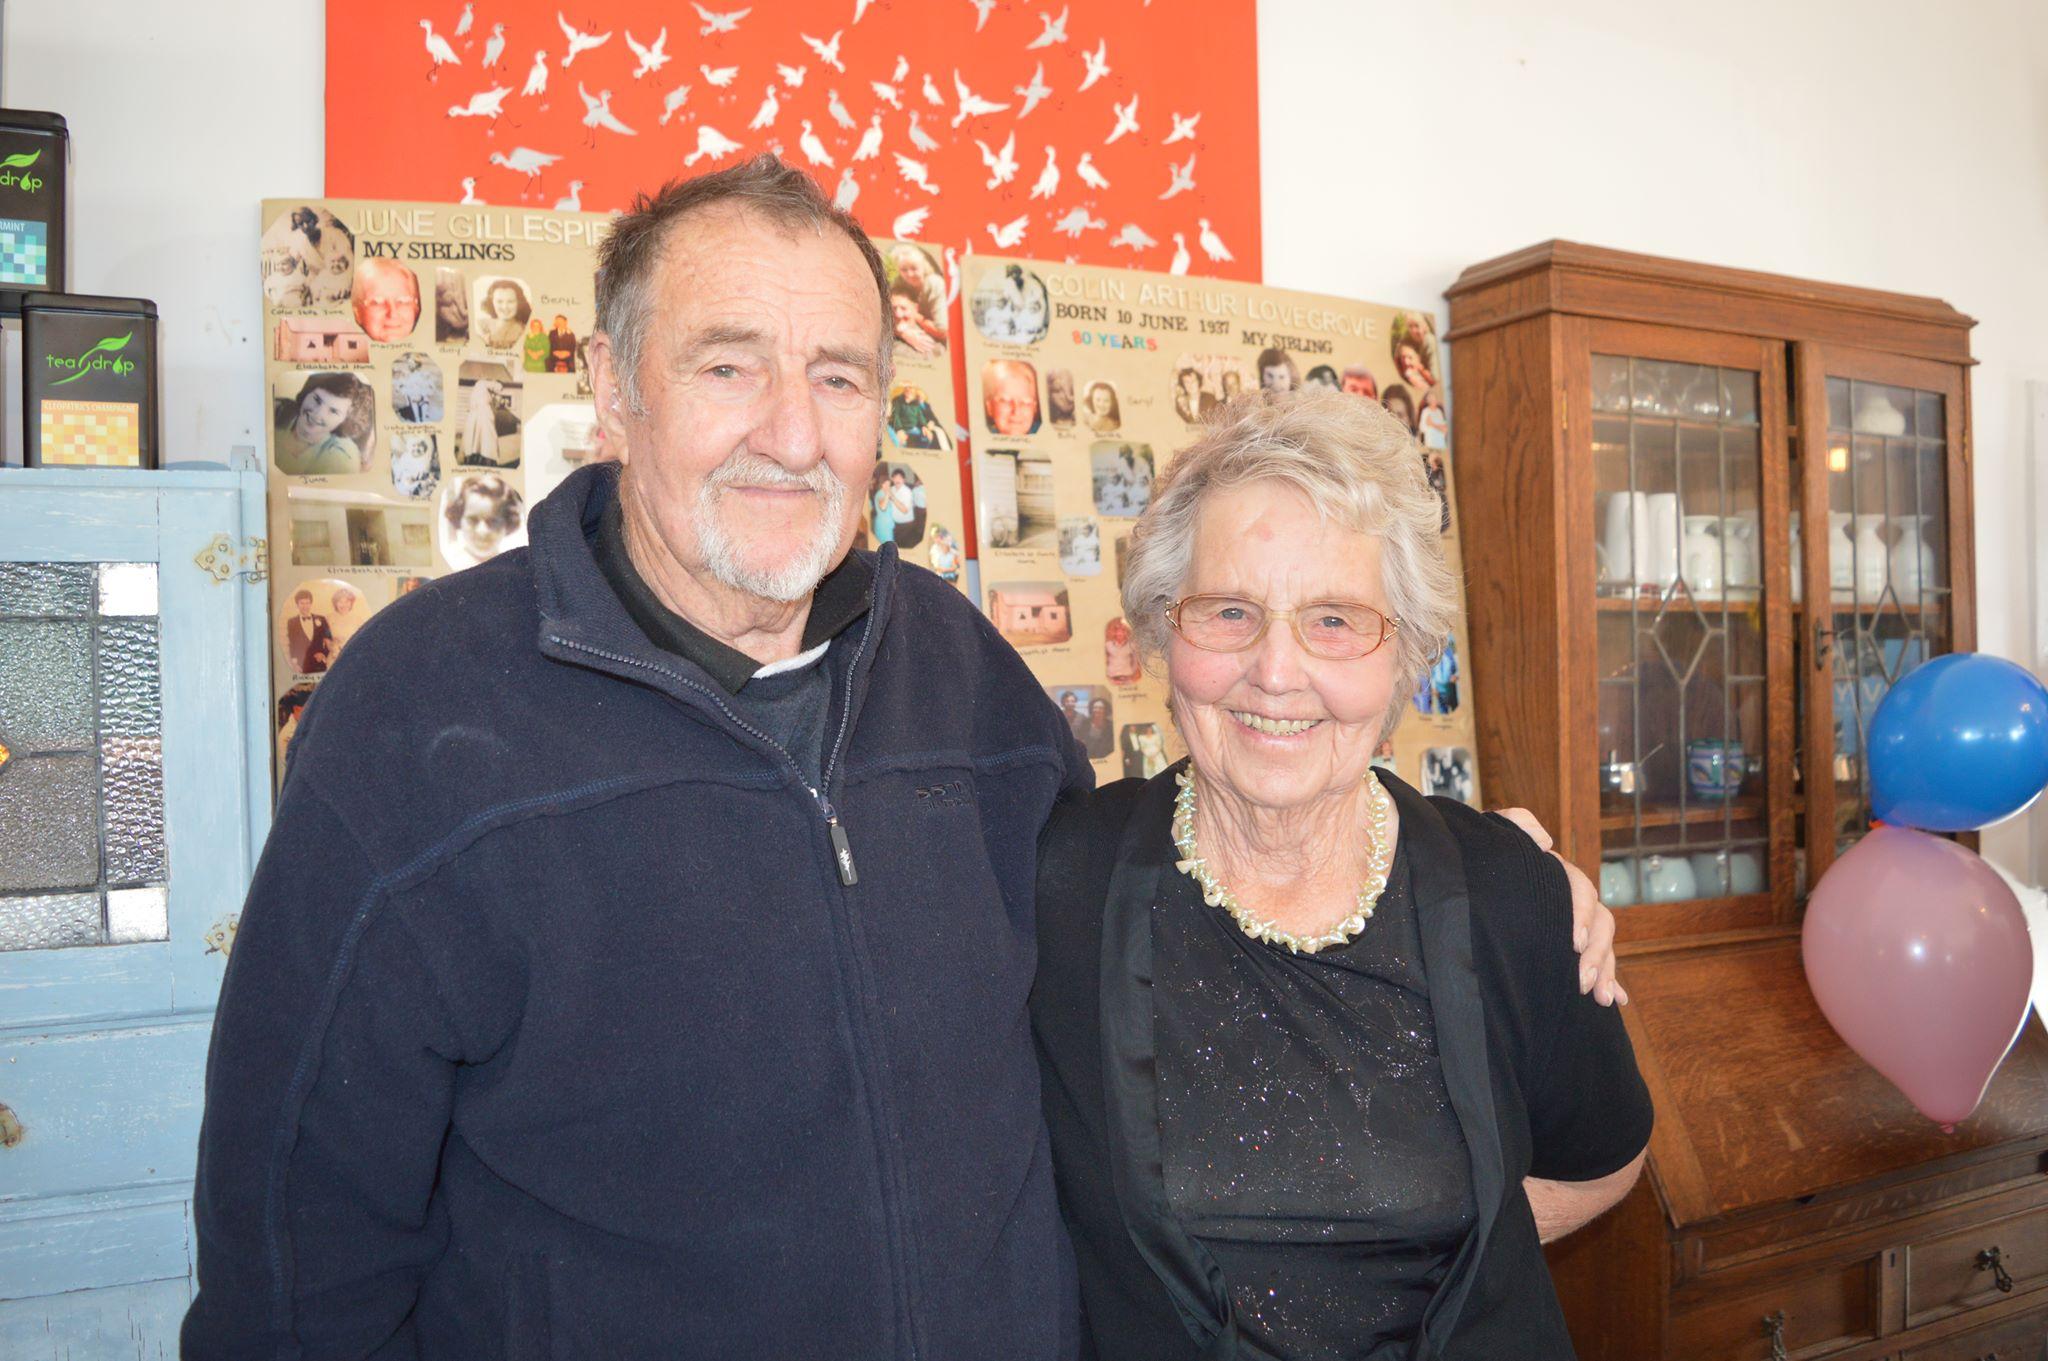 Colin Lovegrove and his twin sister June Gillespie.